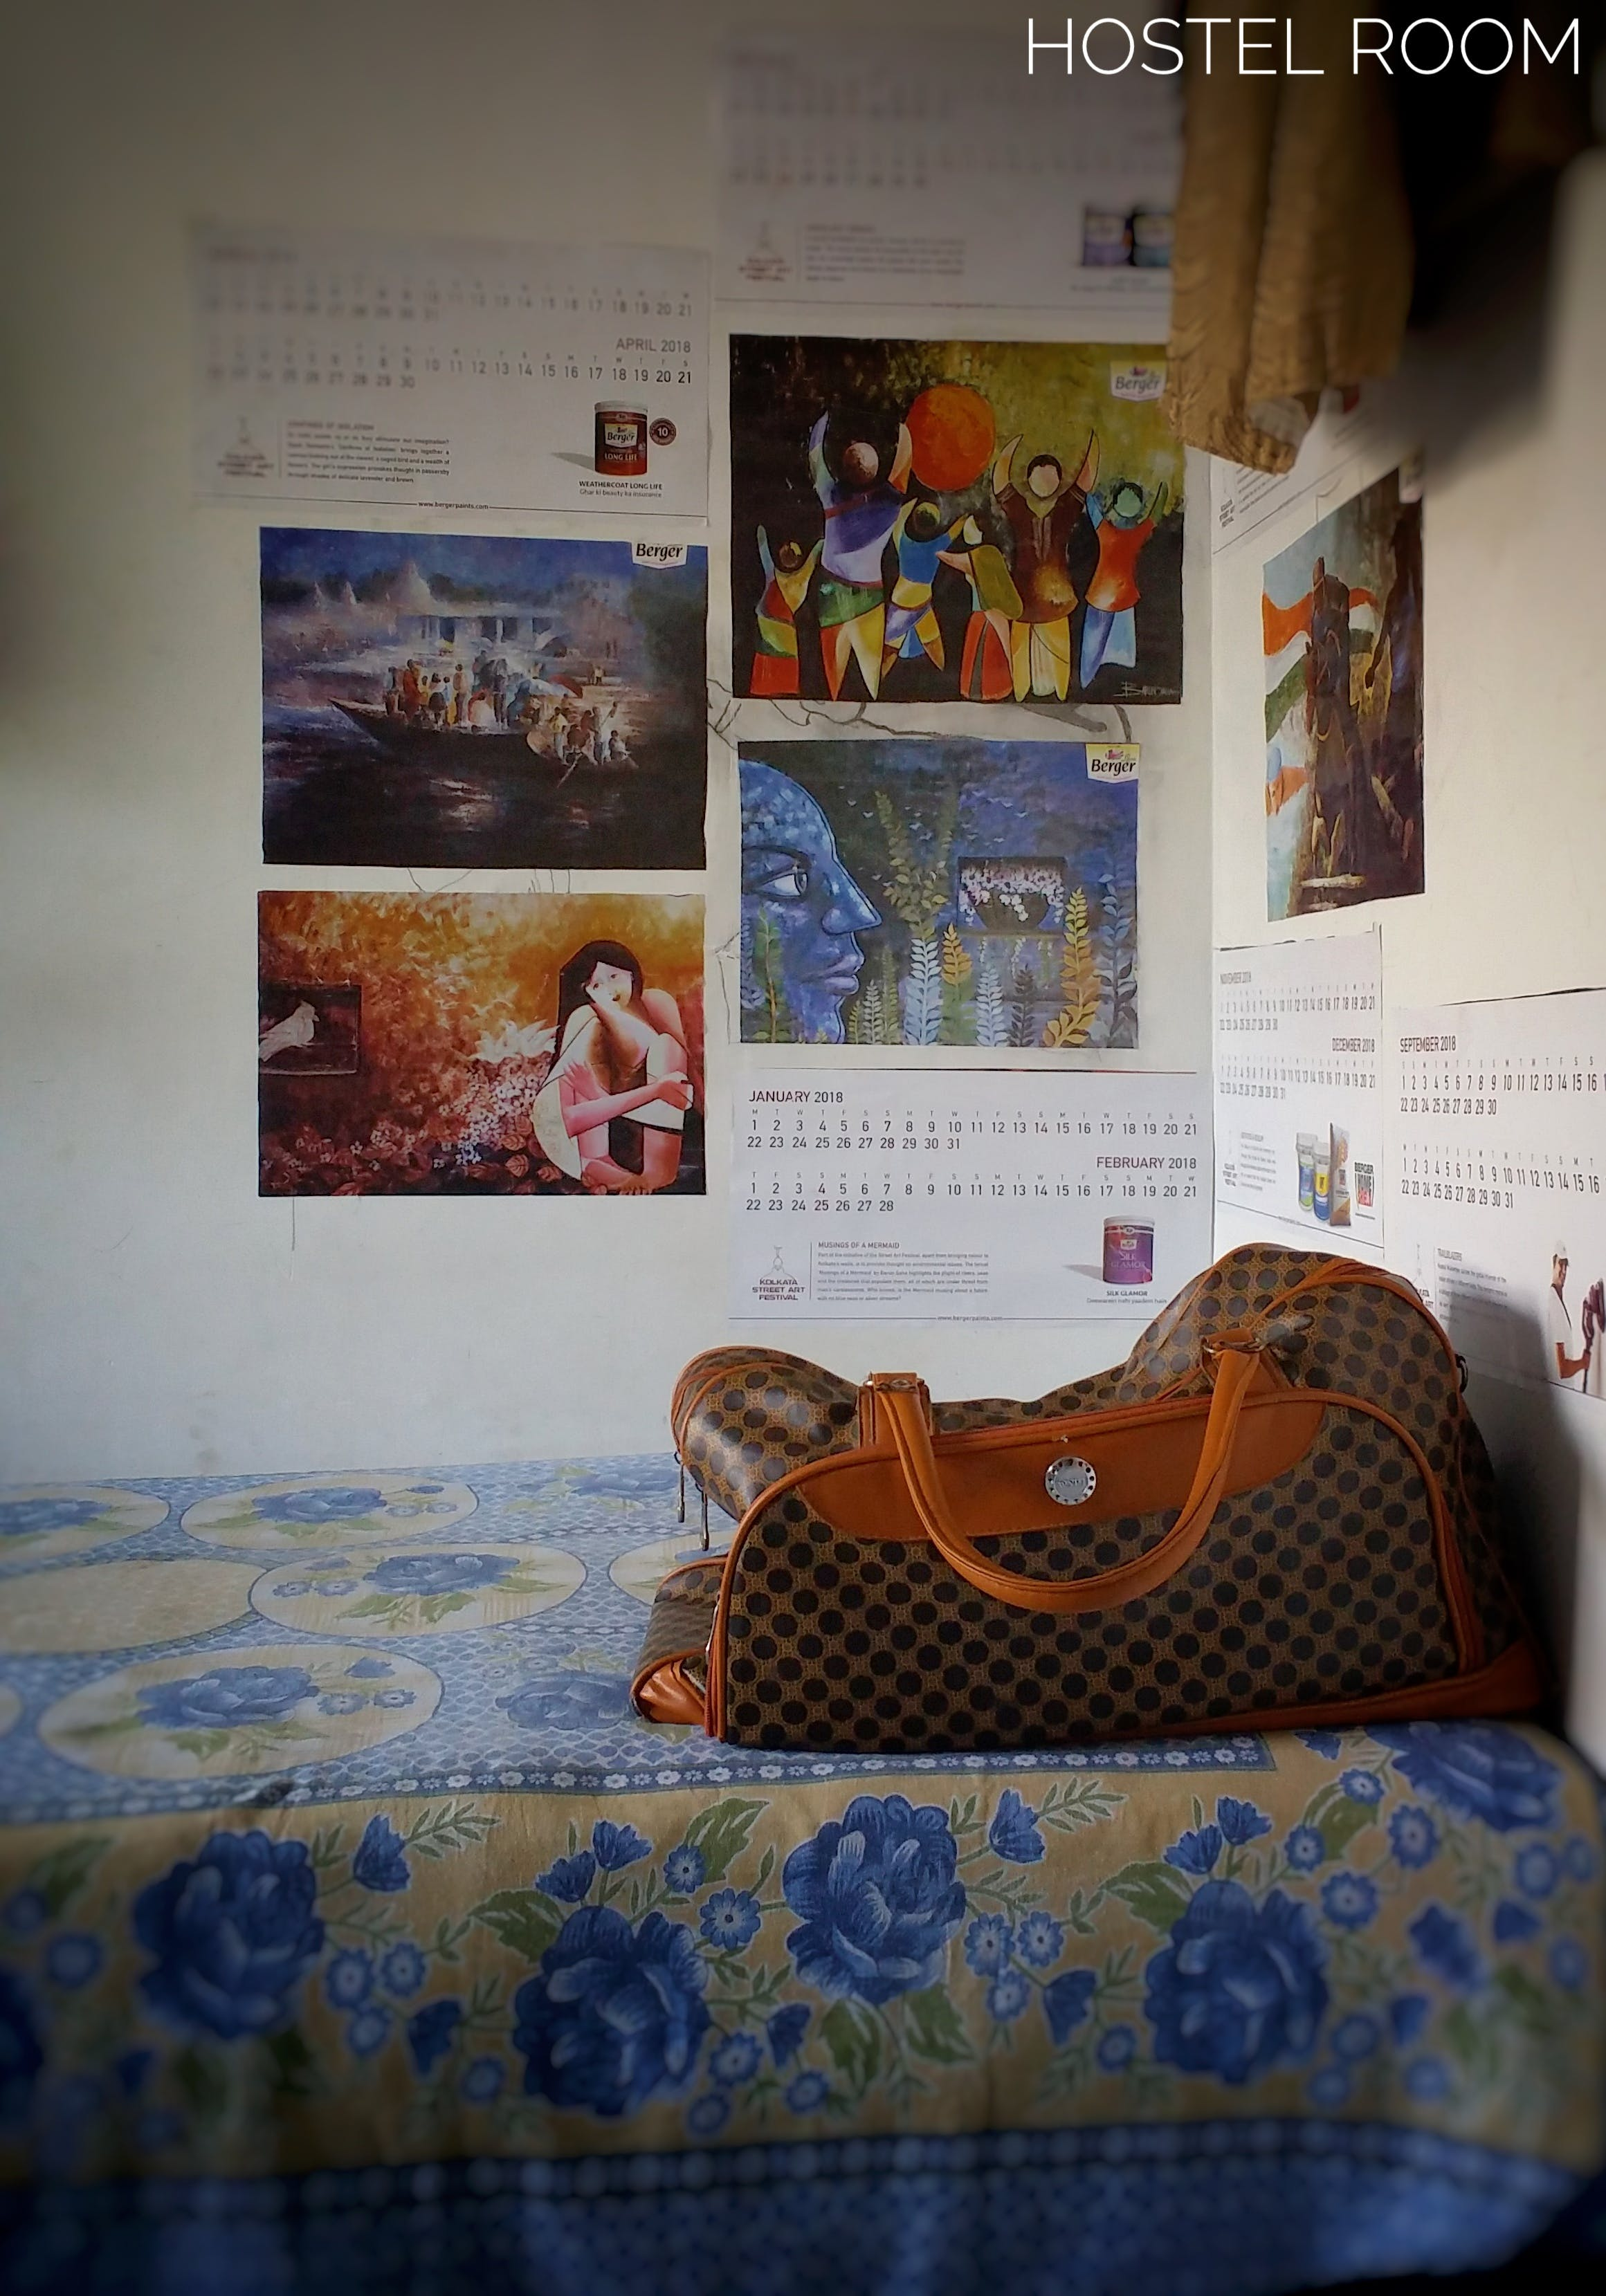 Free stock photo of Sunny Kakati